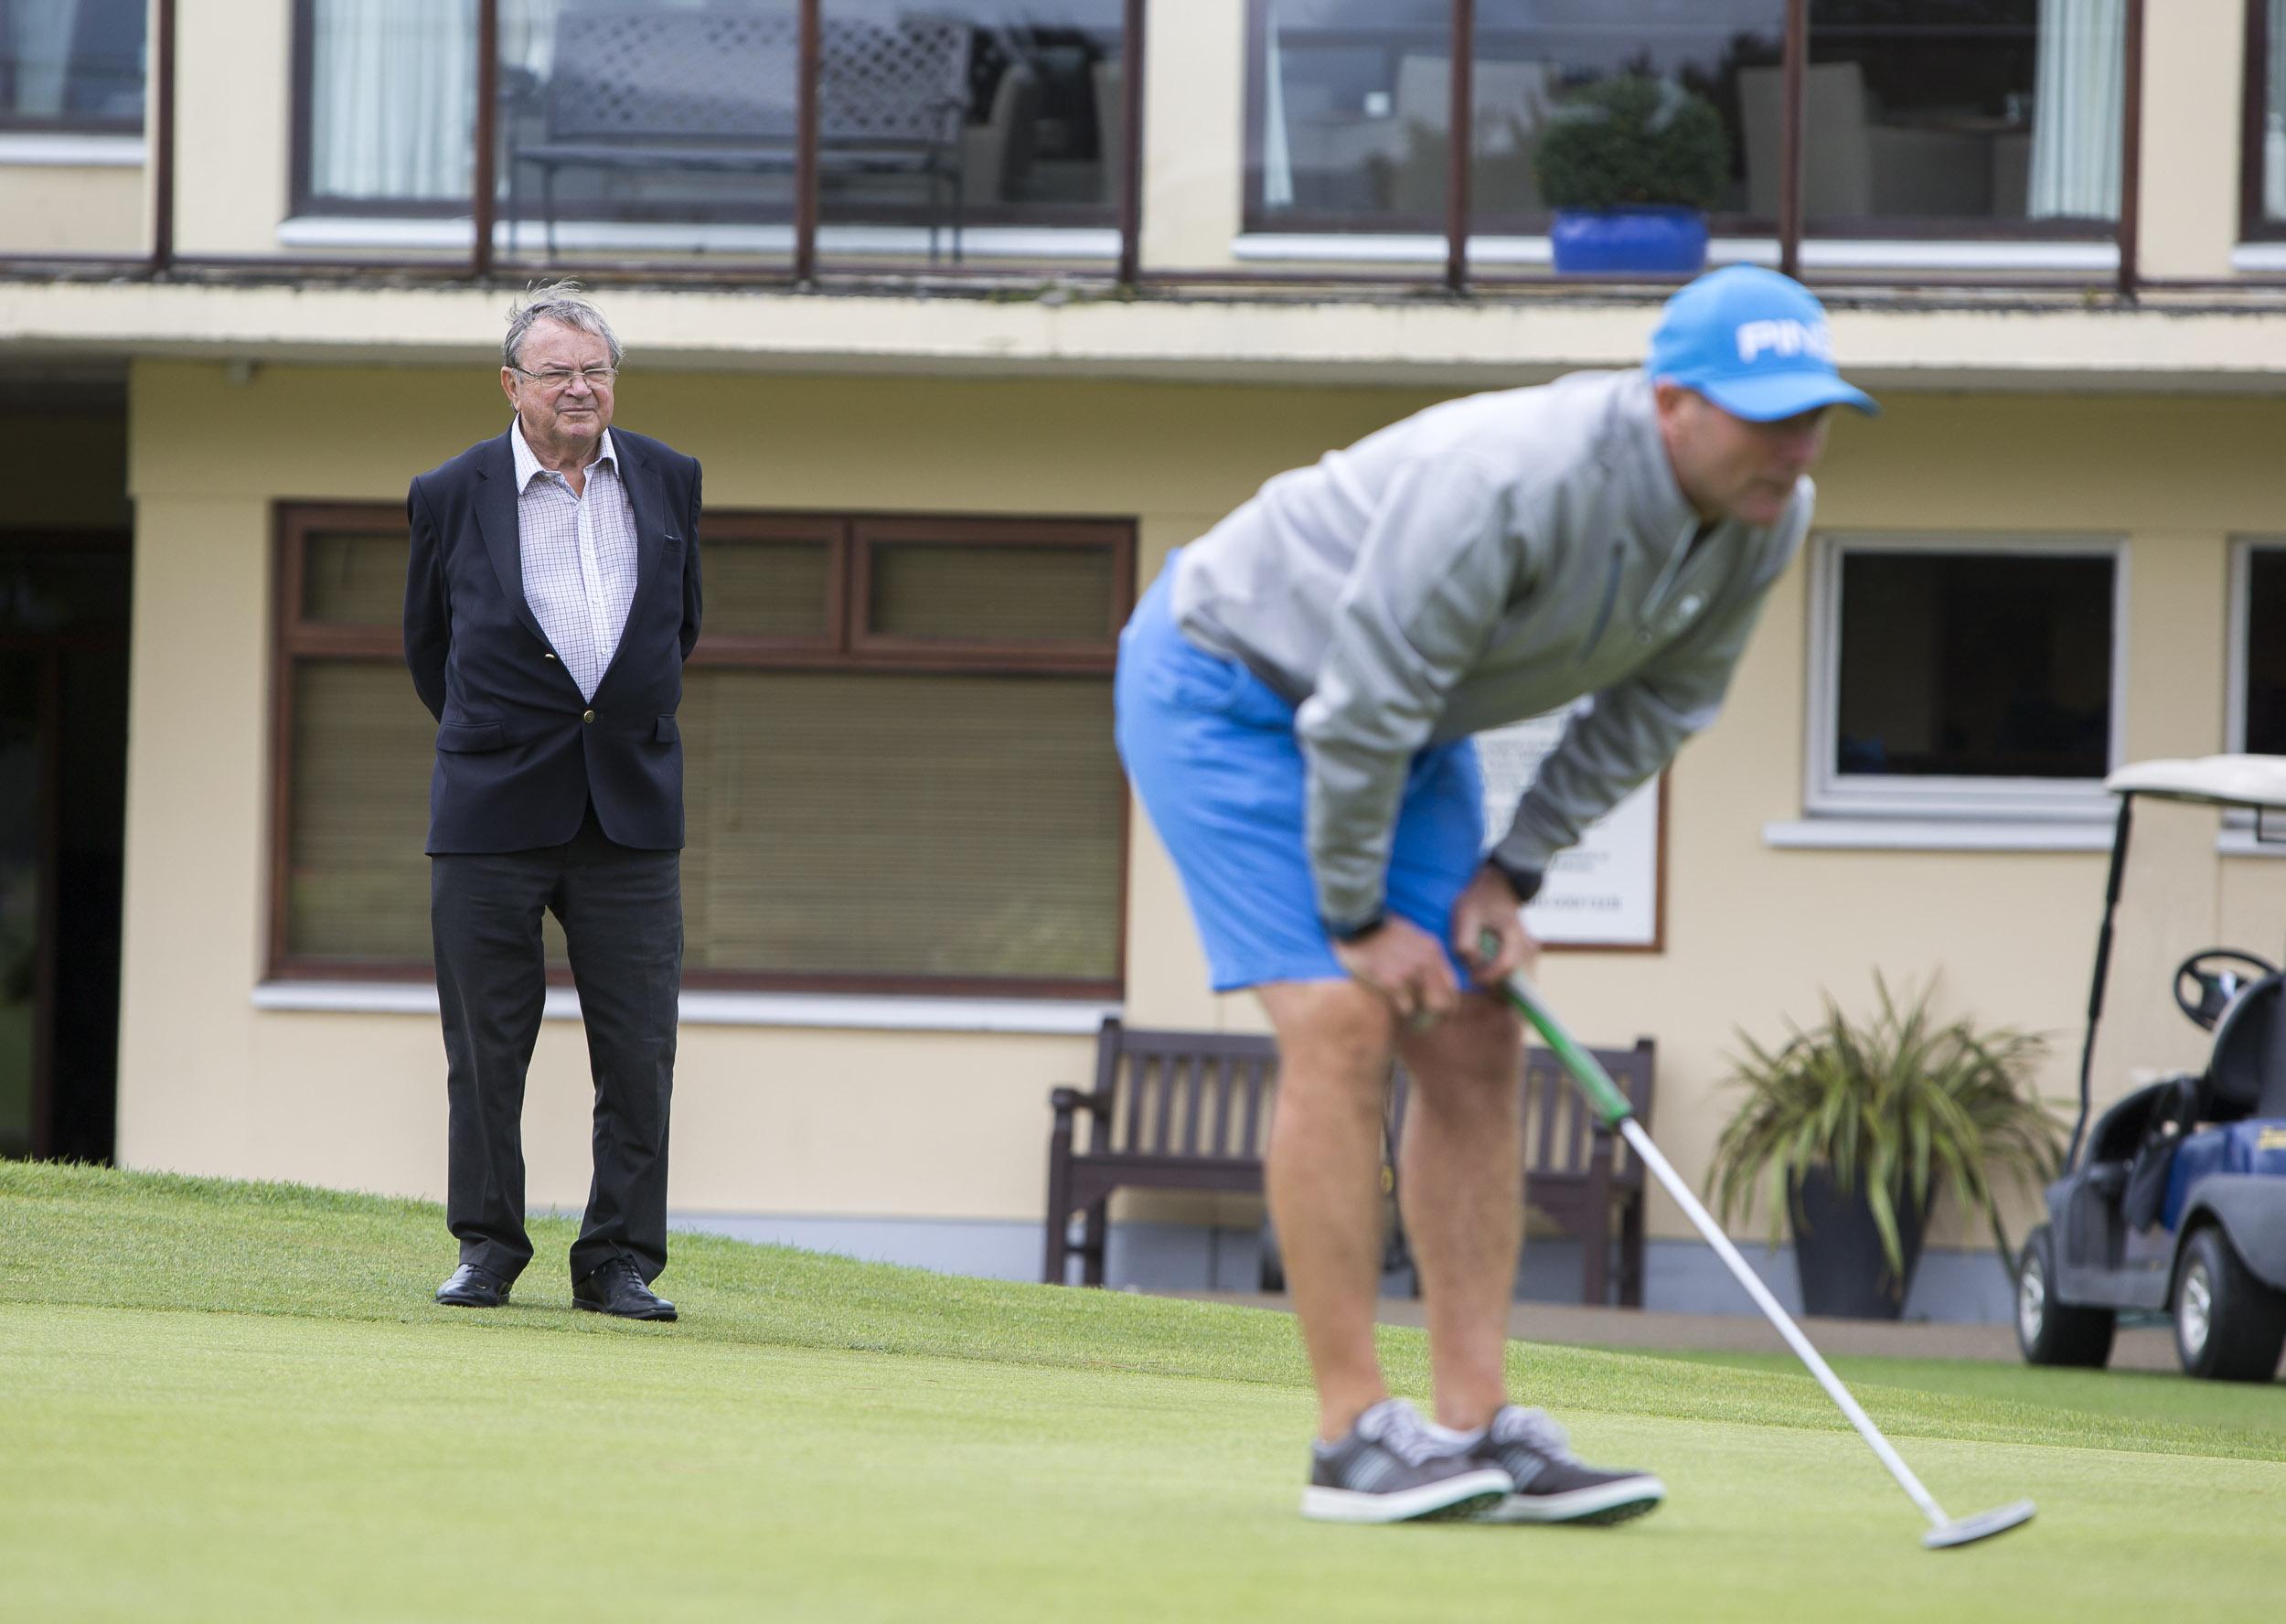 LTavs-Golf-2018-Web-28.jpg